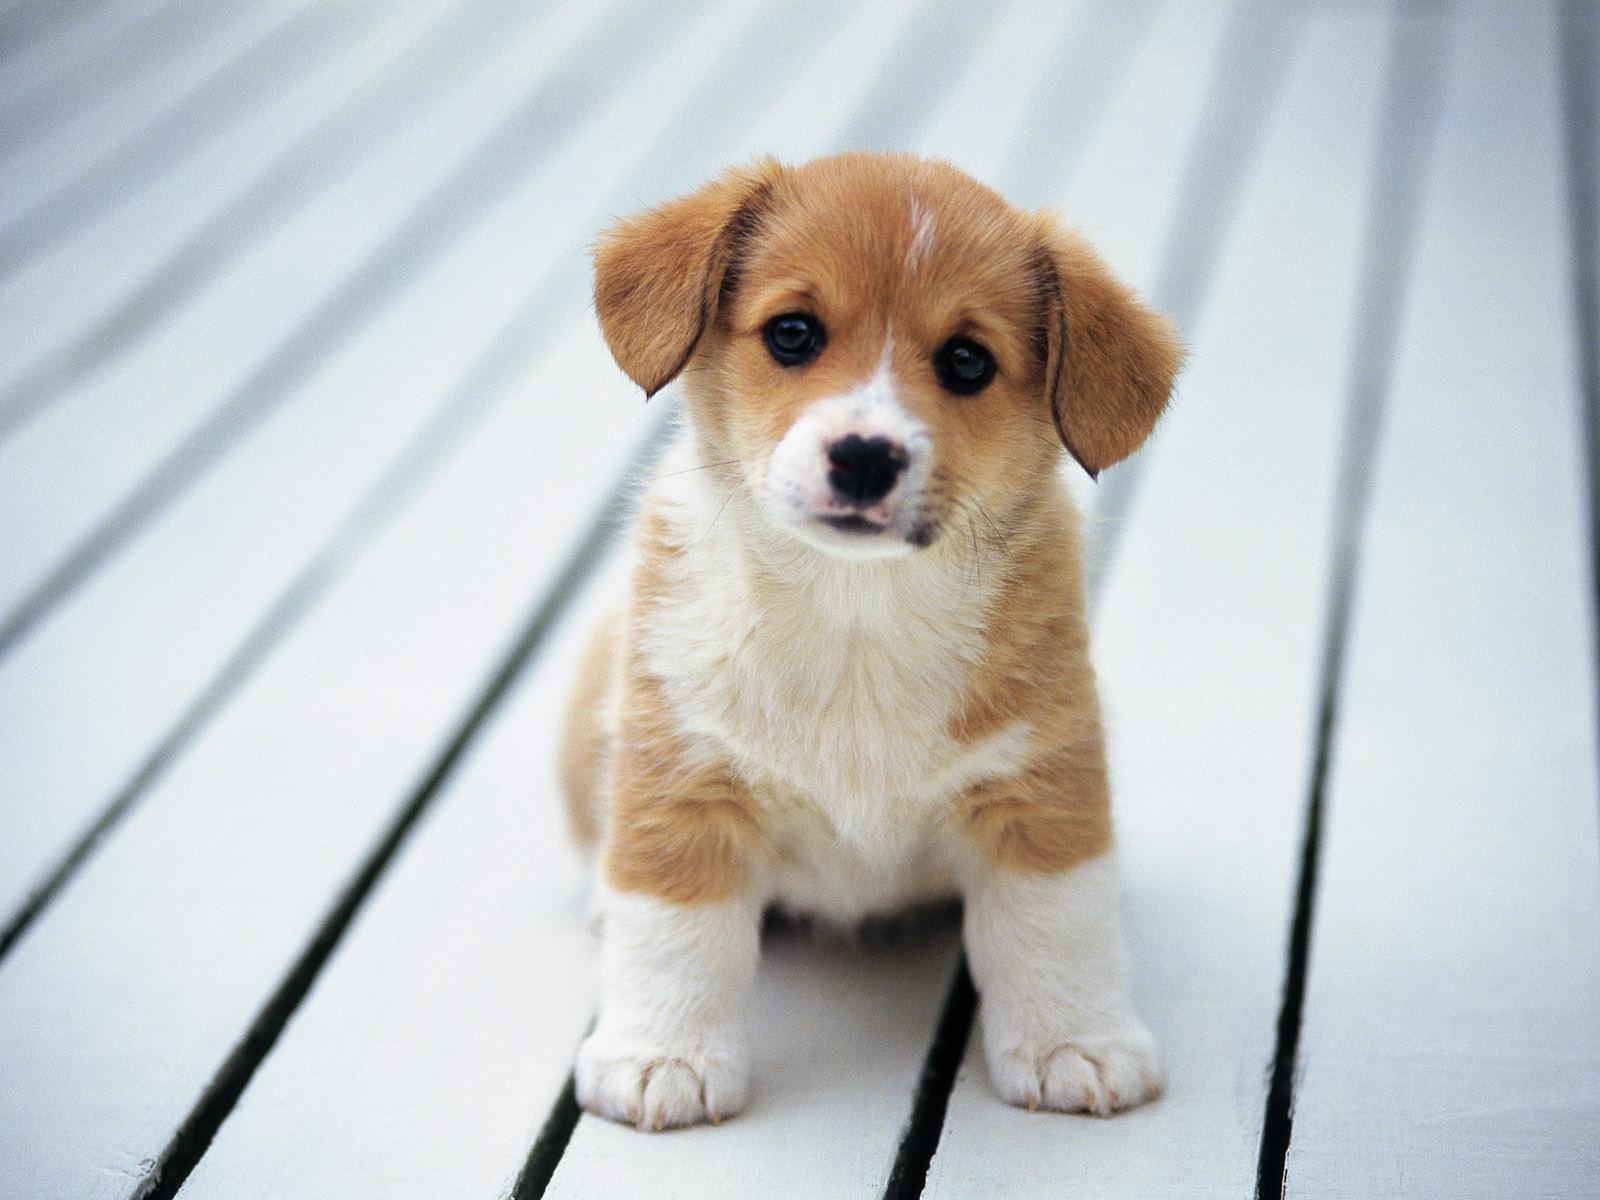 cute puppy A3